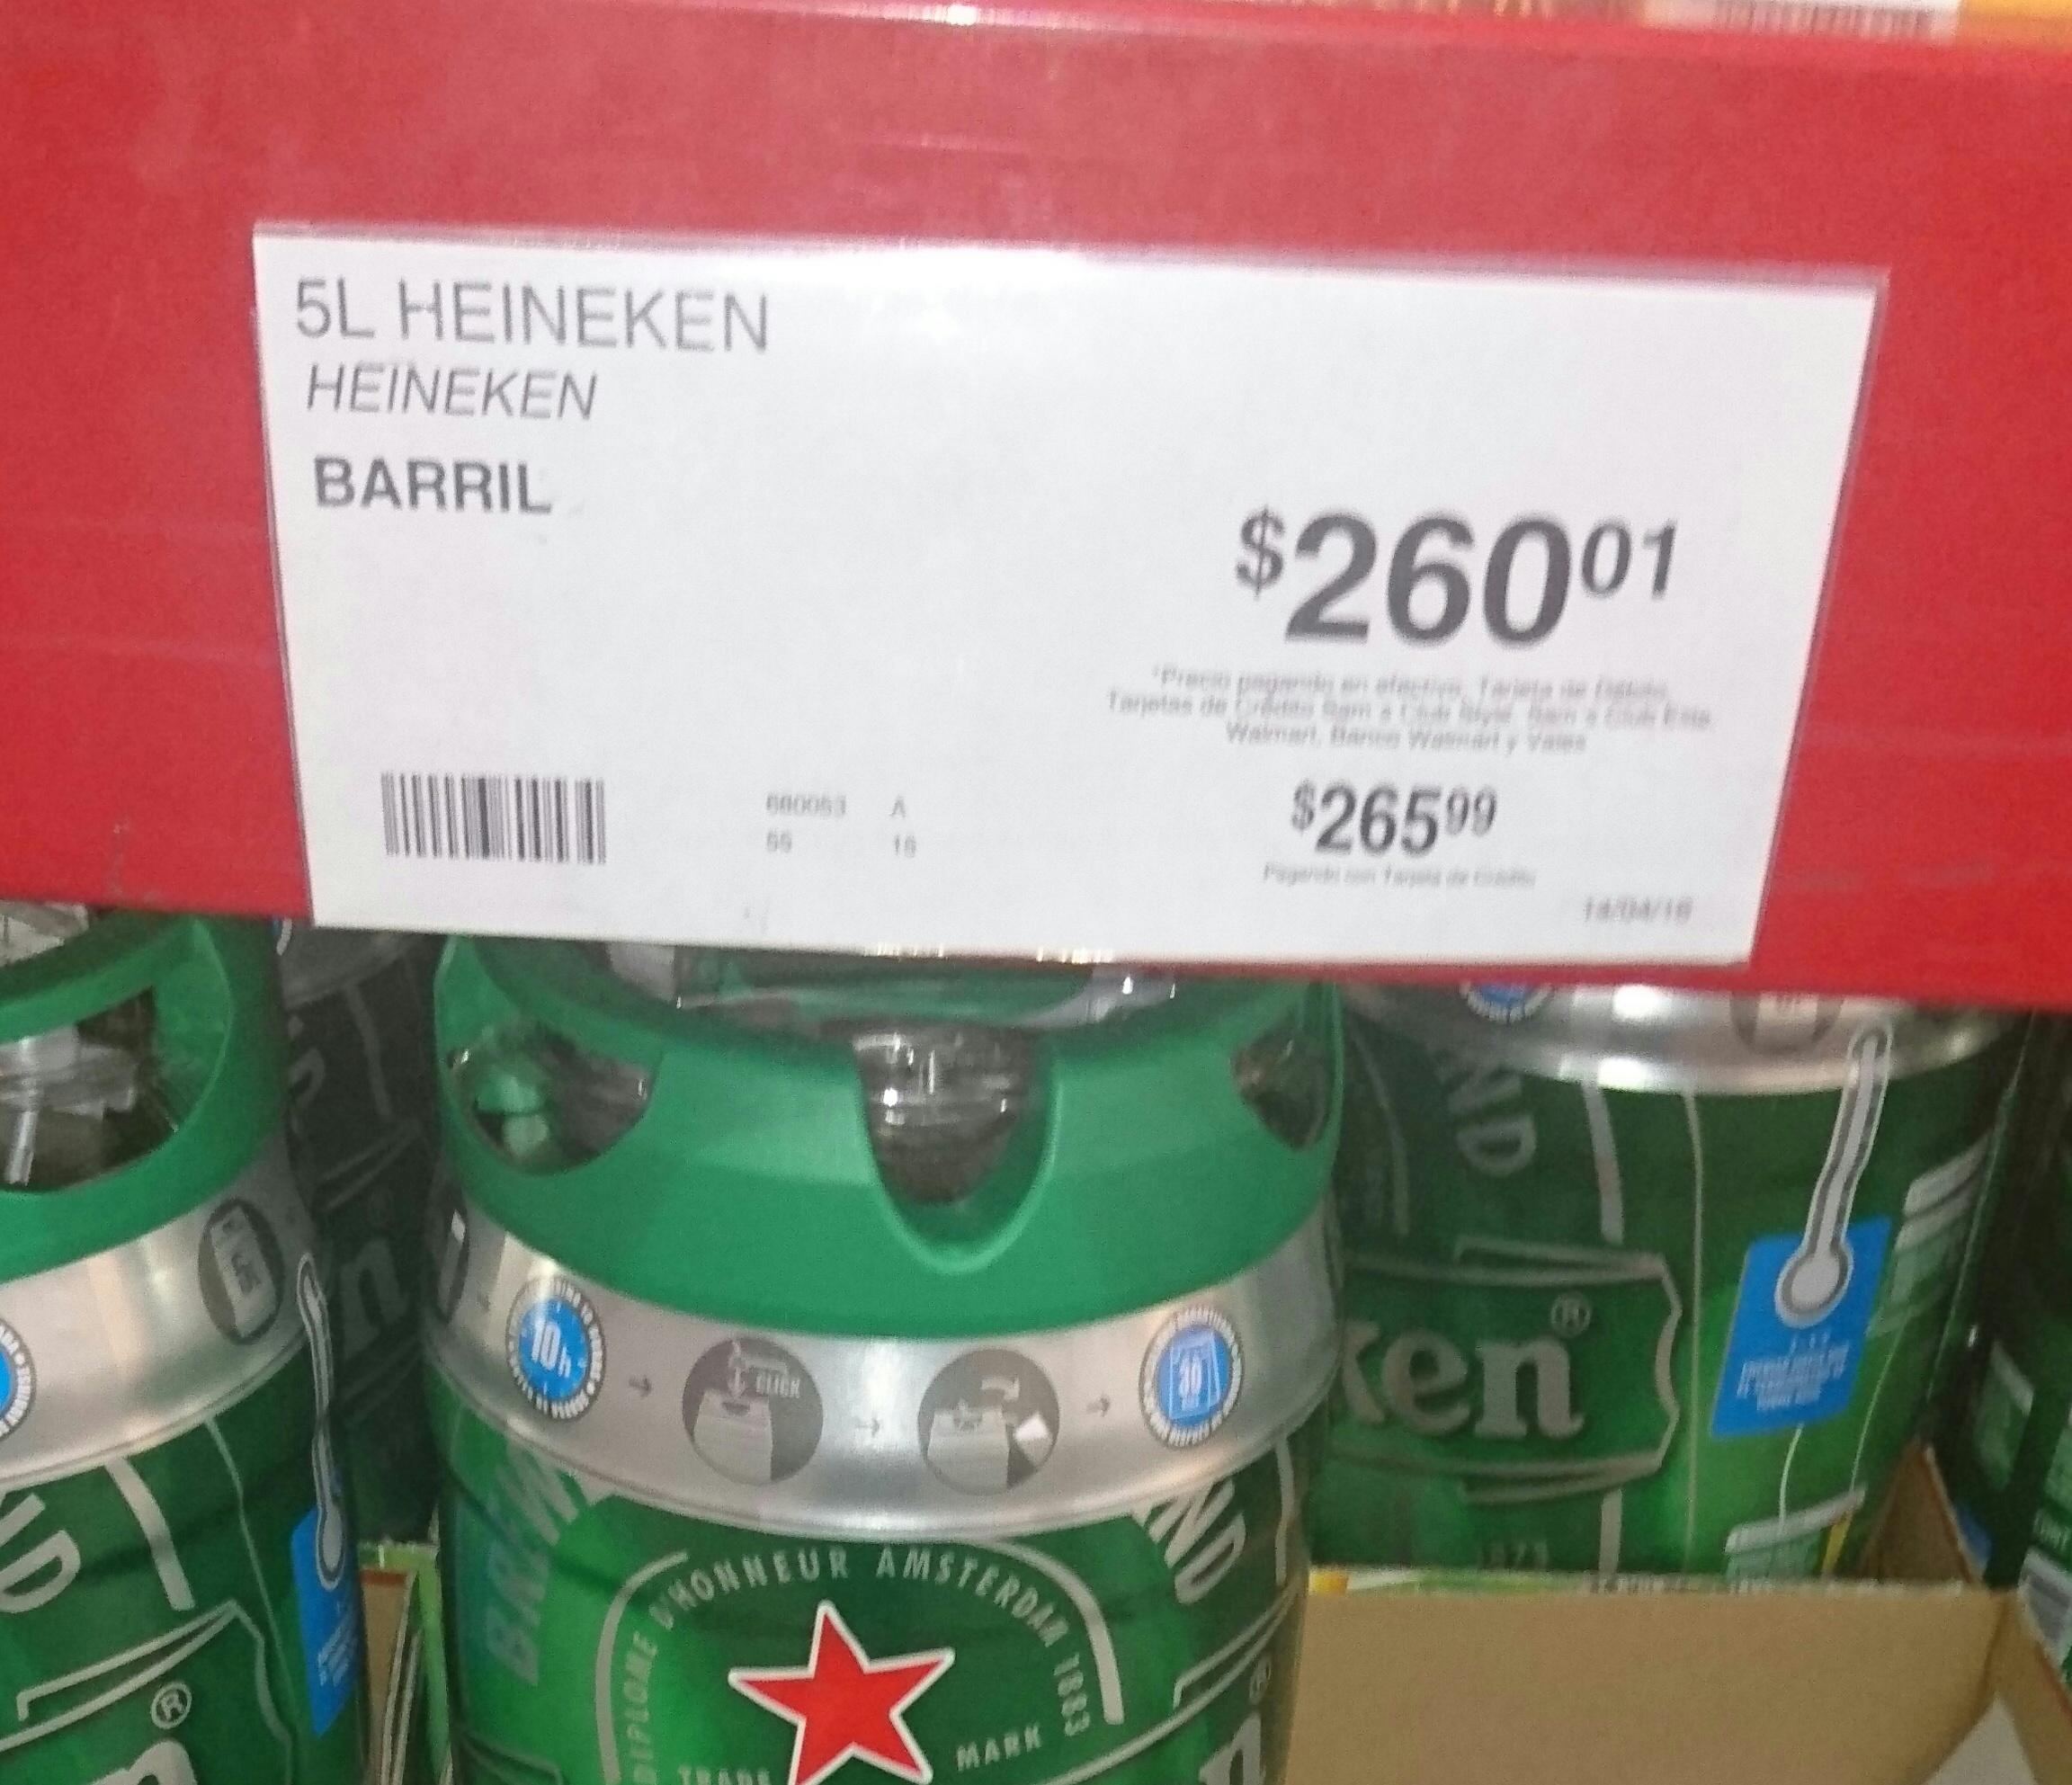 Sam's Club: barril Heineken 5 lts a $260.01